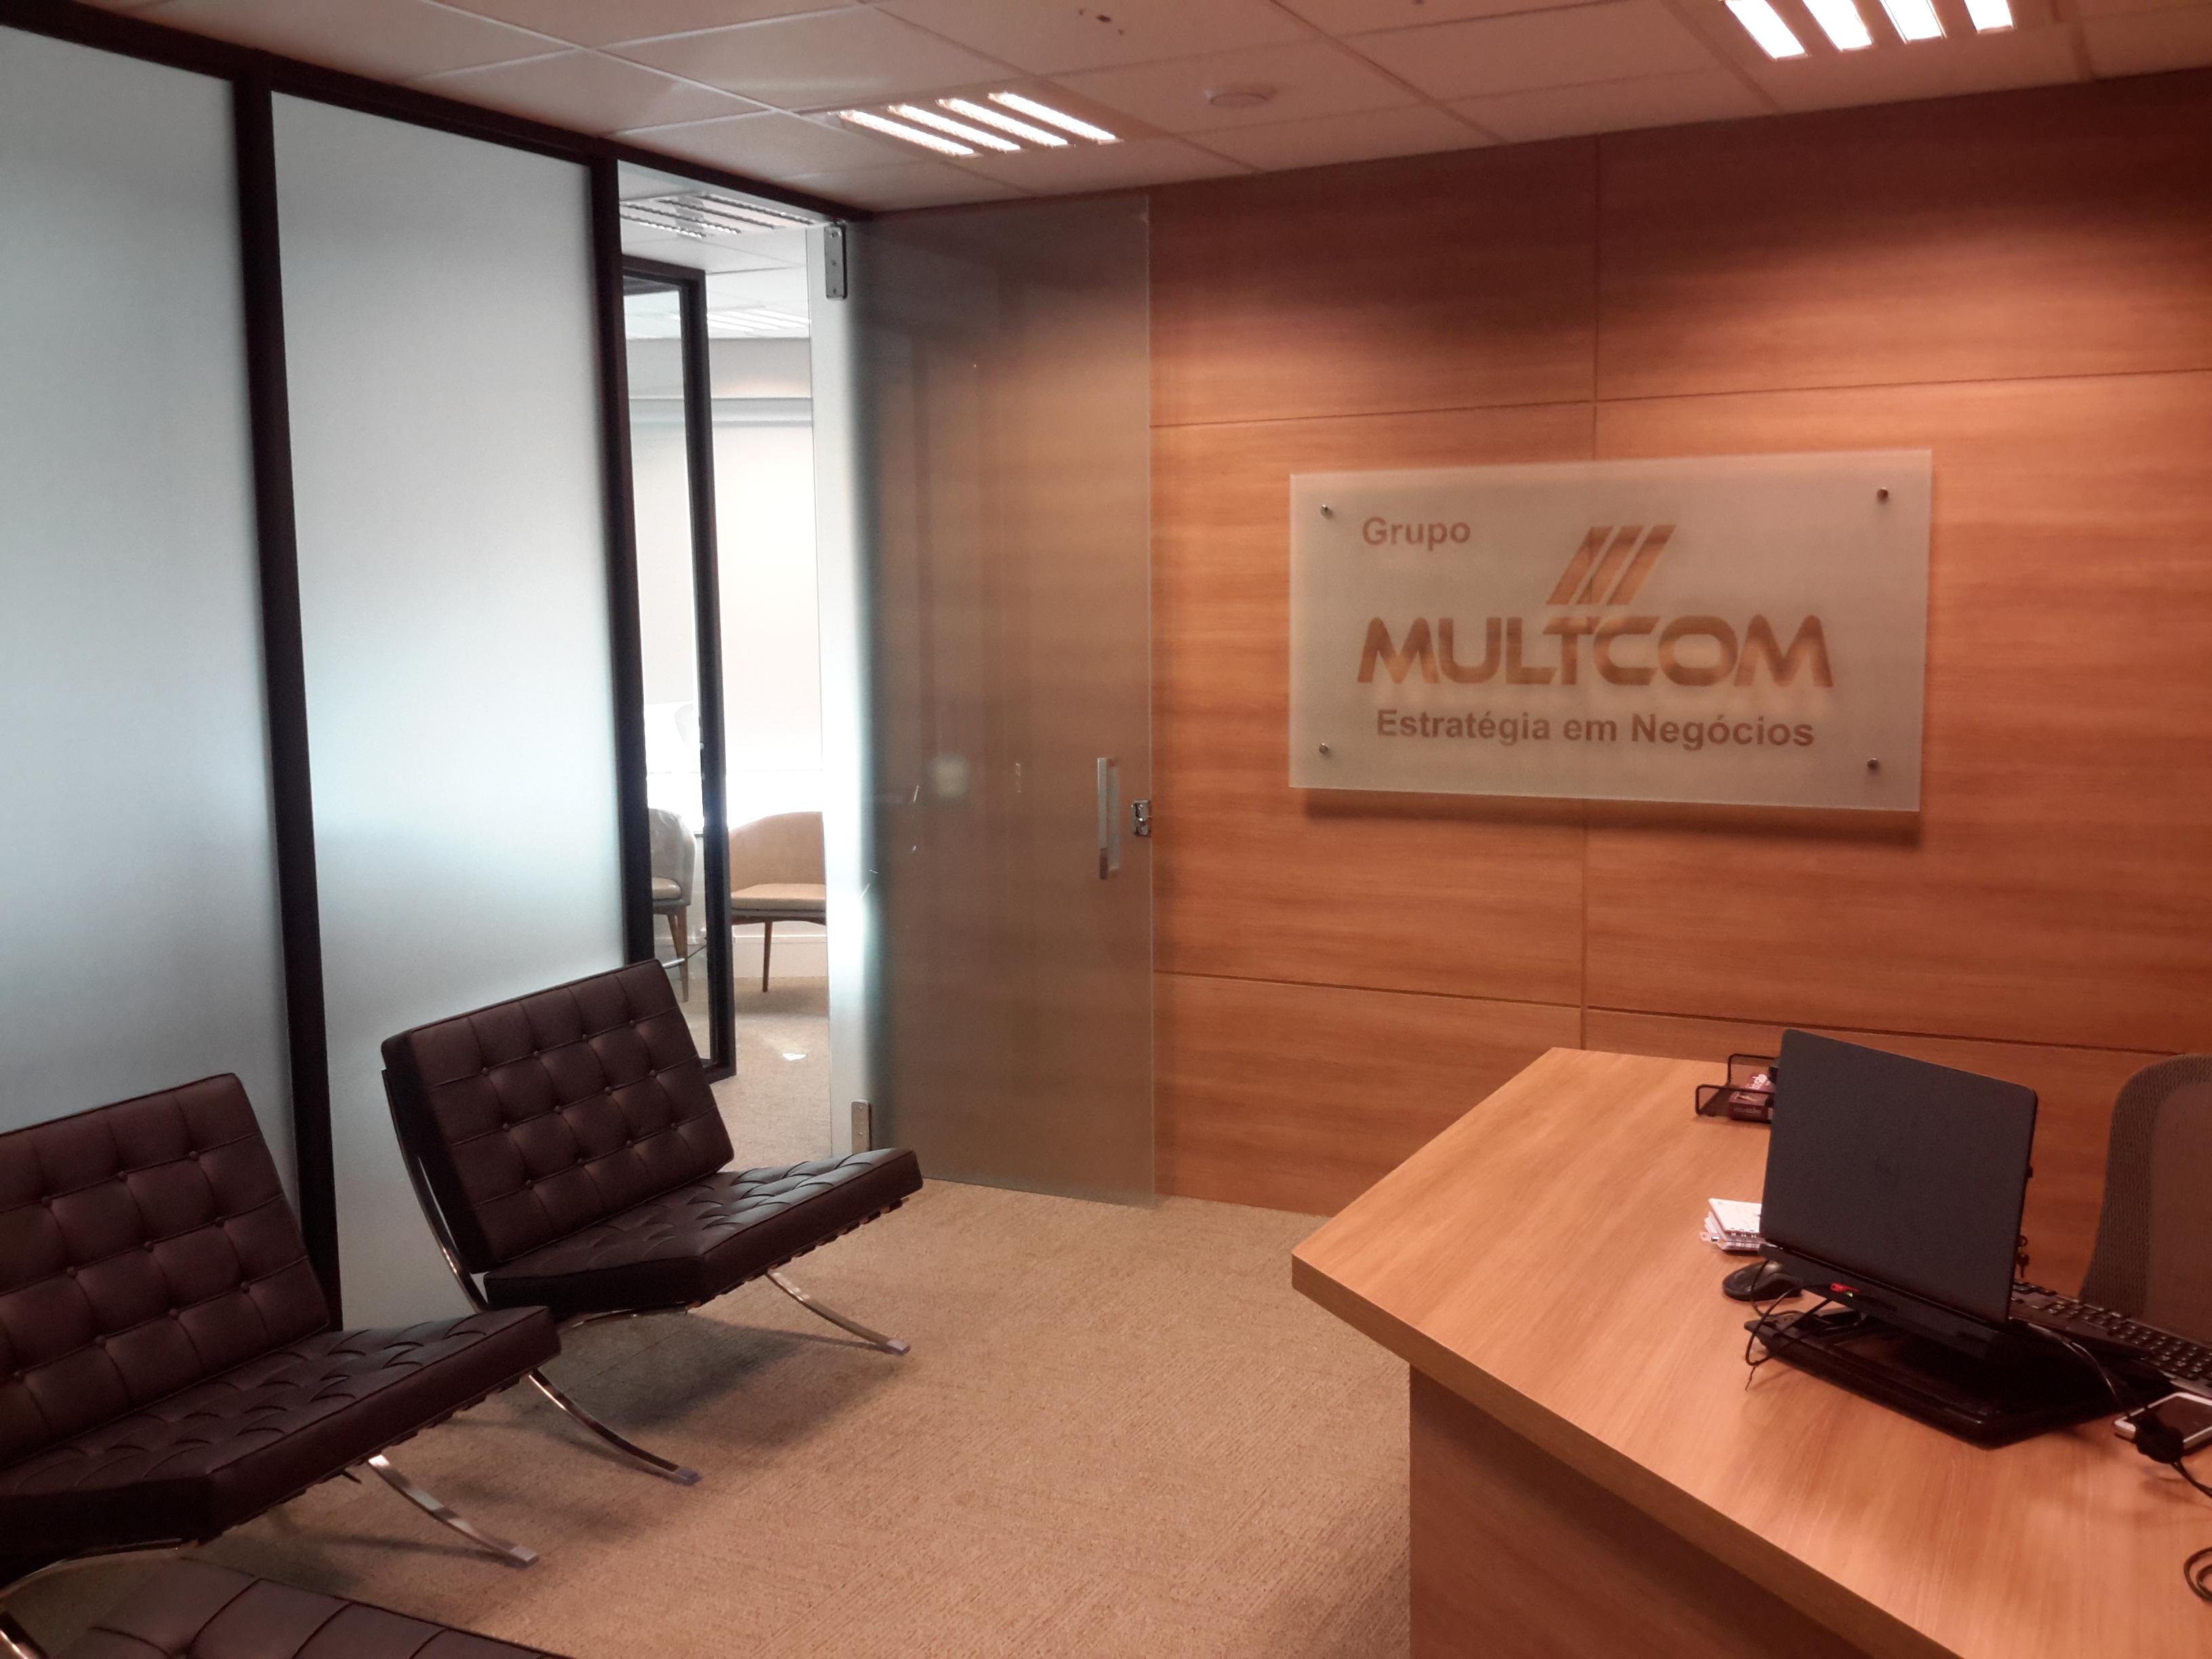 MULTCOM UBT